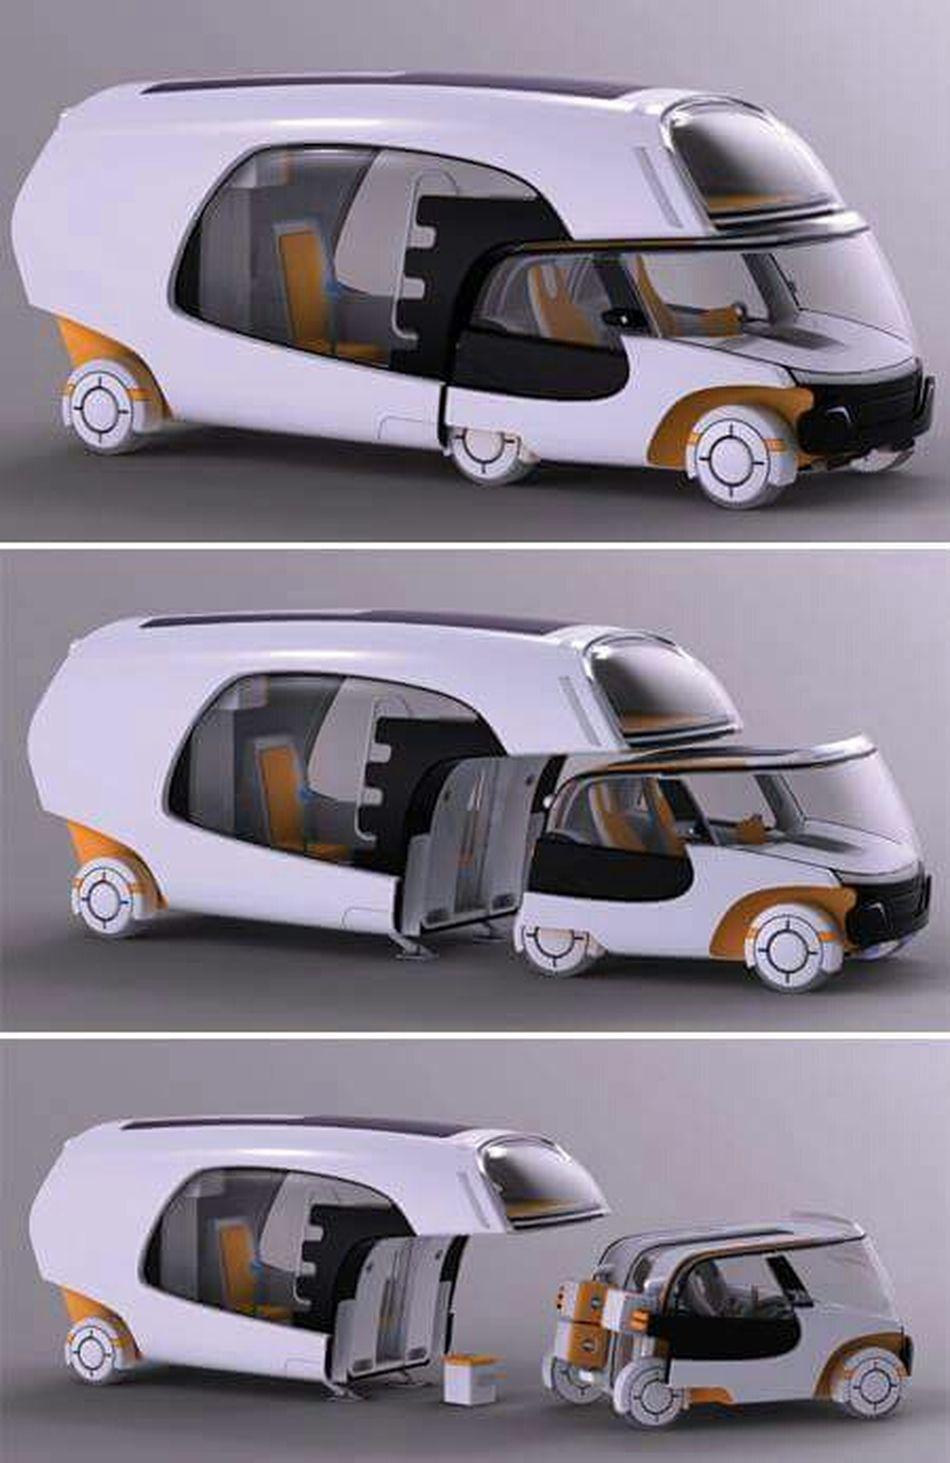 Really Modern Car Araba Tasarım Karavan Perfect Engineer Dizayn